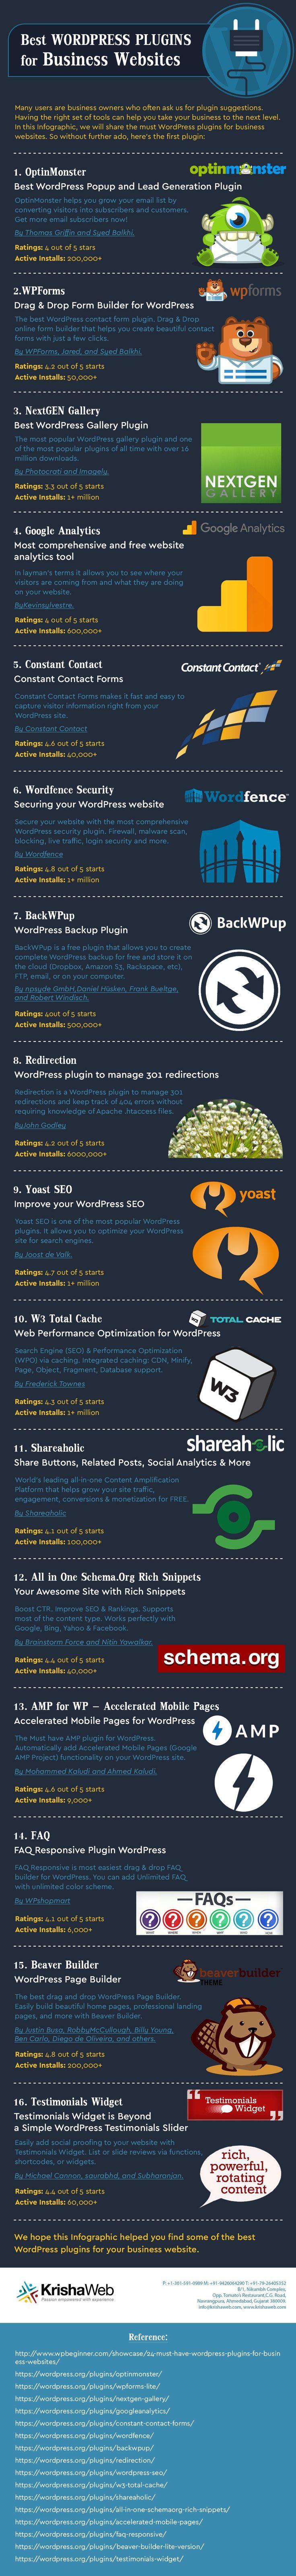 Best WordPress plugins for business websites